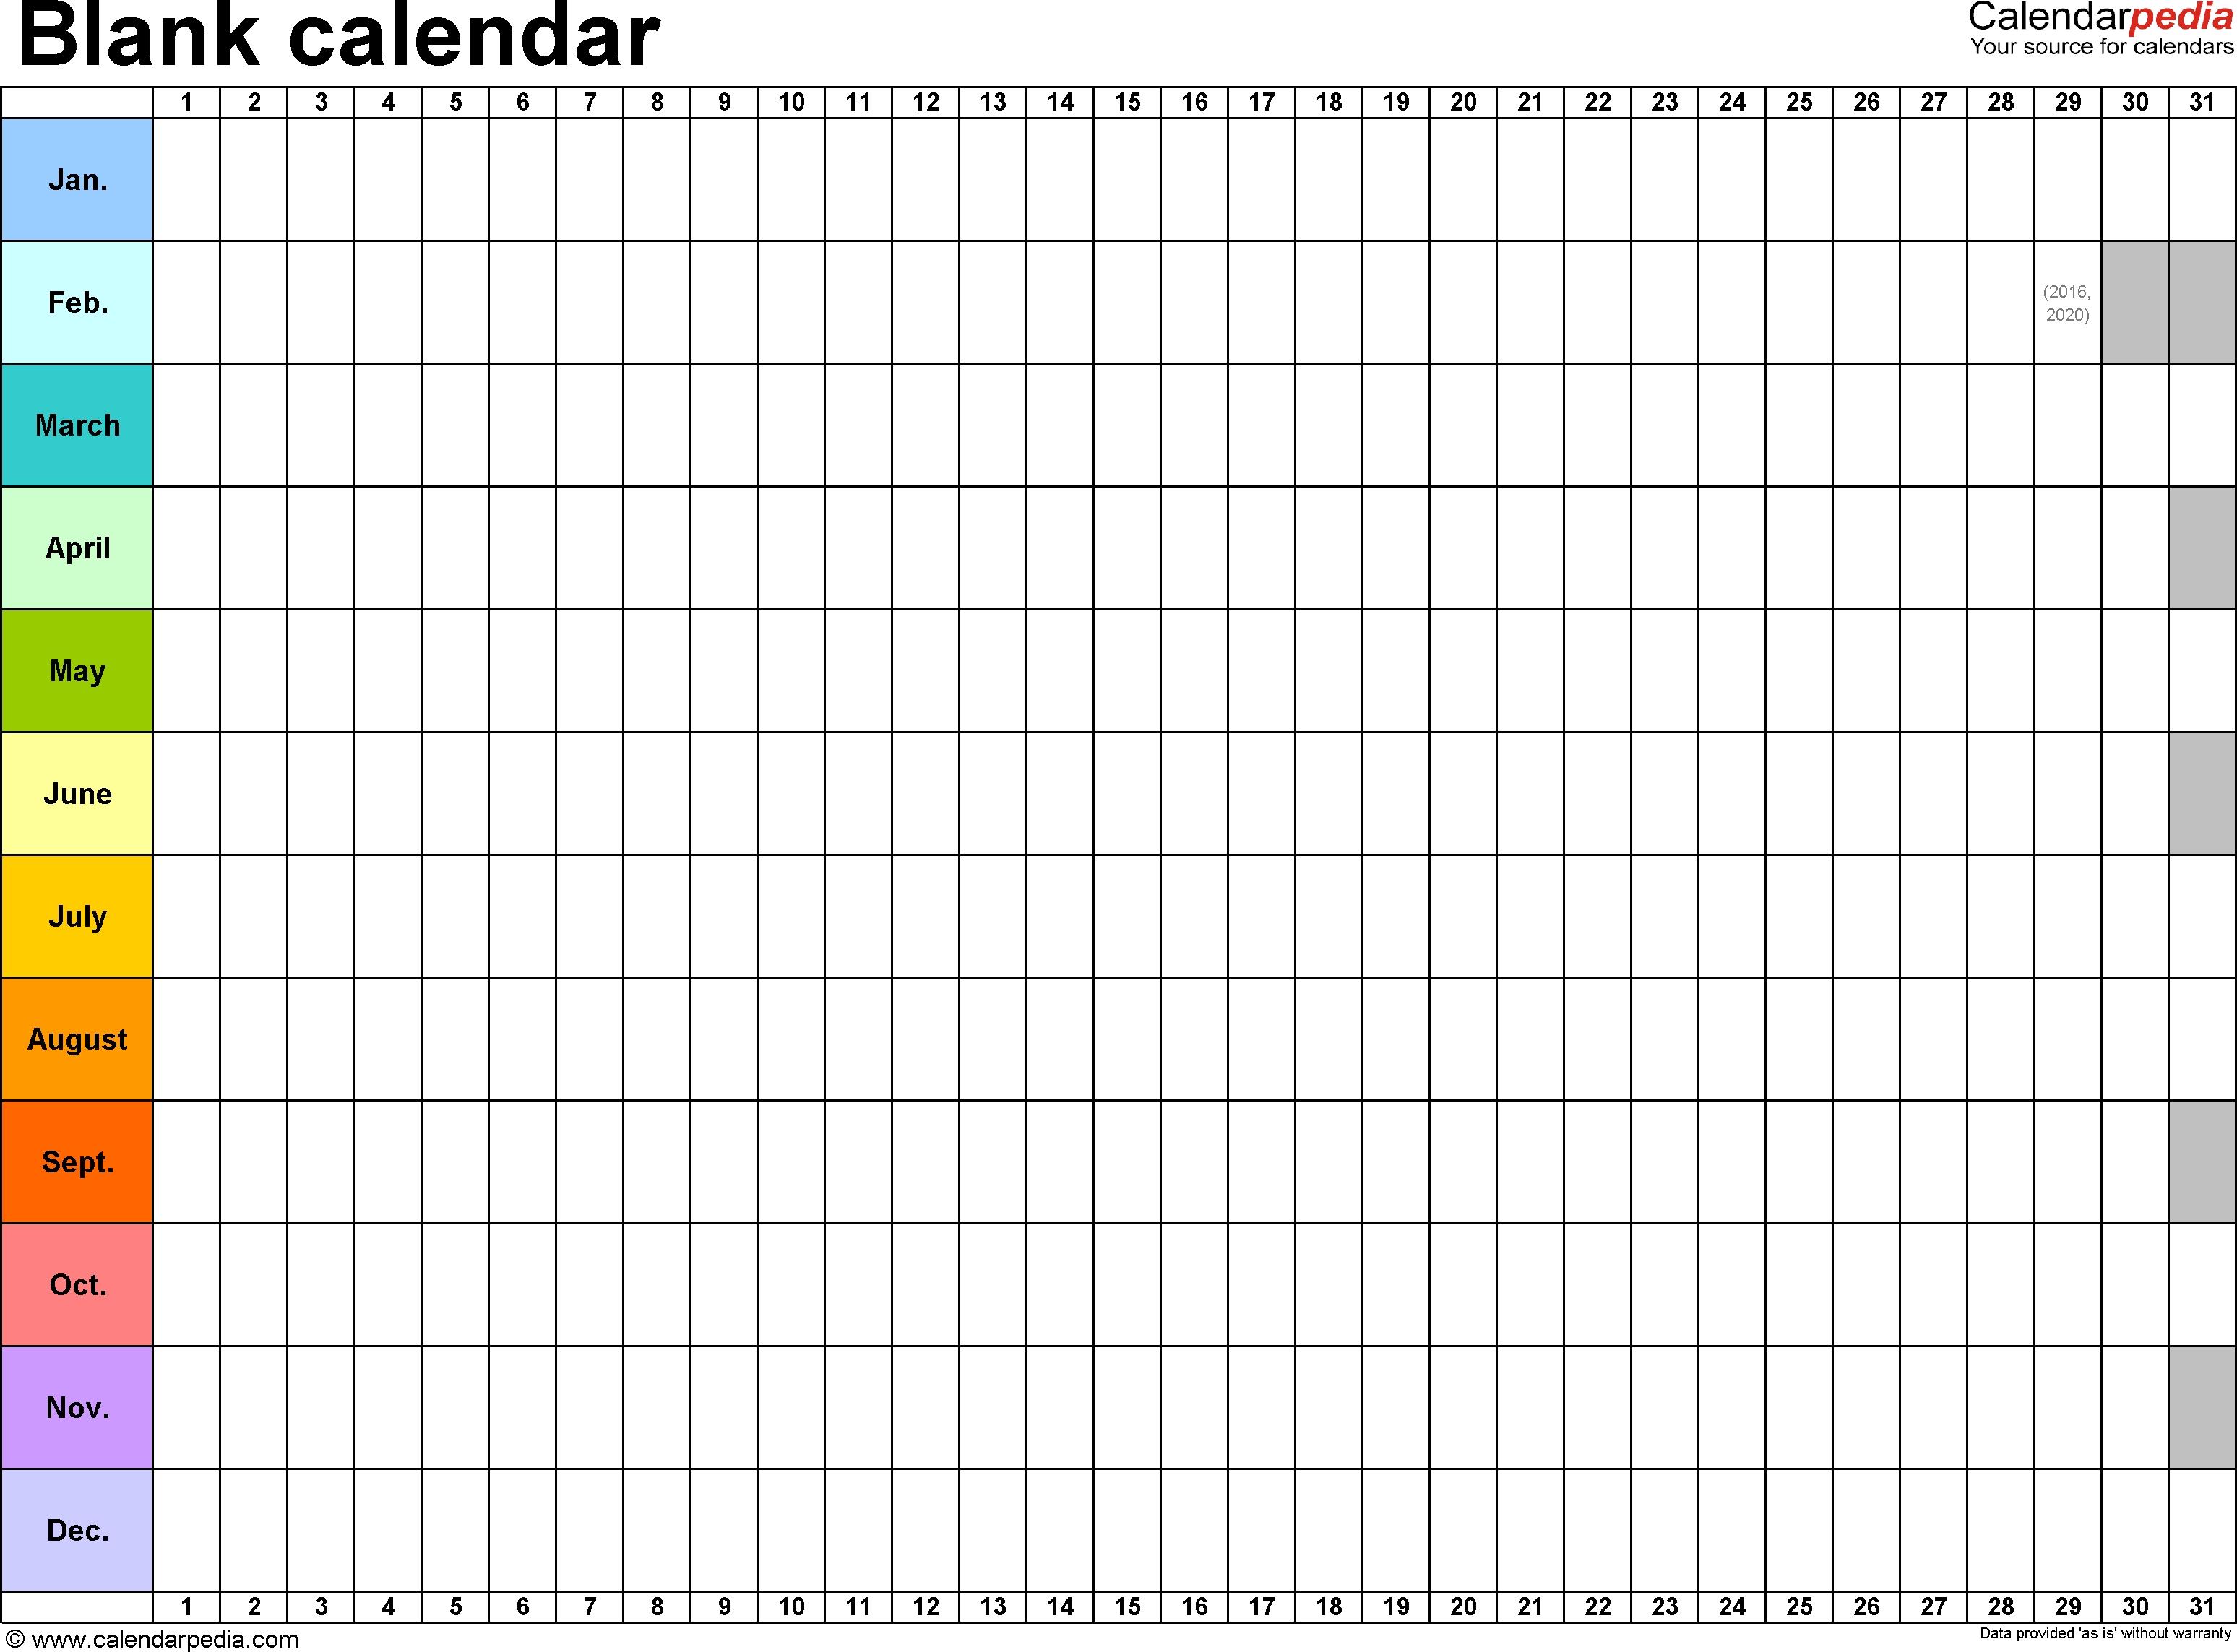 Blank Calendar - 9 Free Printable Microsoft Word Templates intended for Printable Editable Monthly Calendar Template